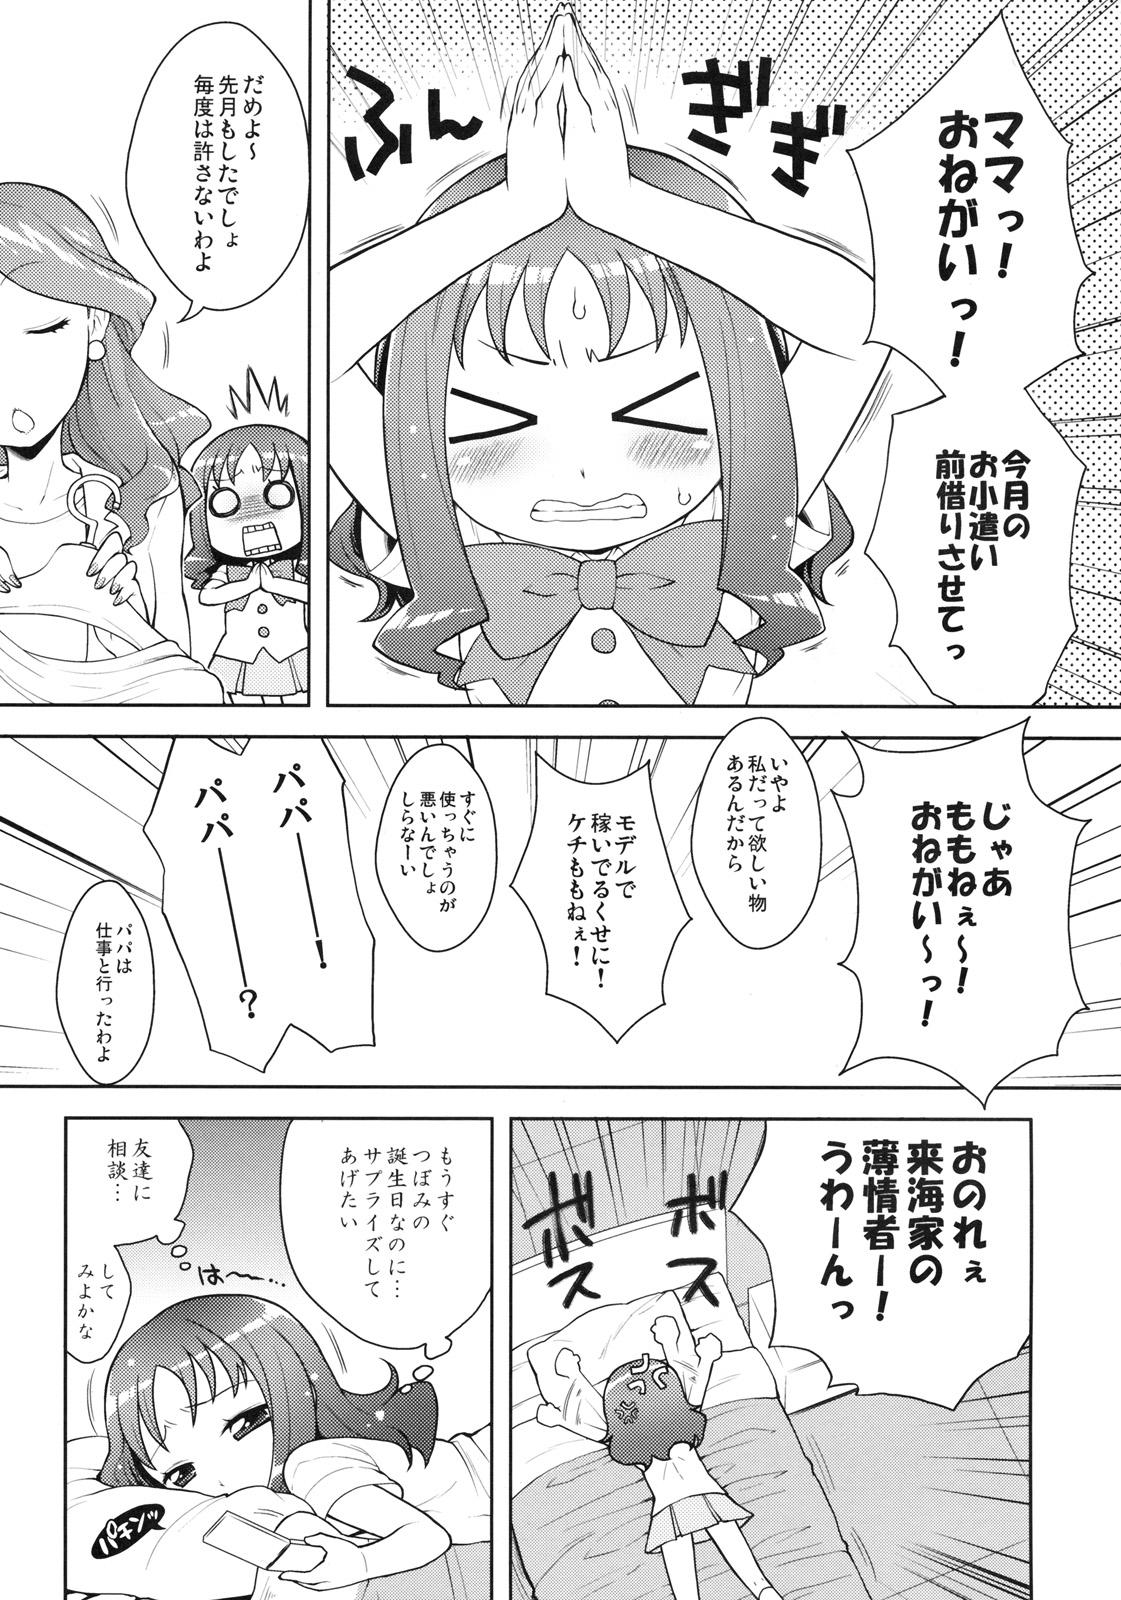 Erika to Nakayoshi Ecchi 3